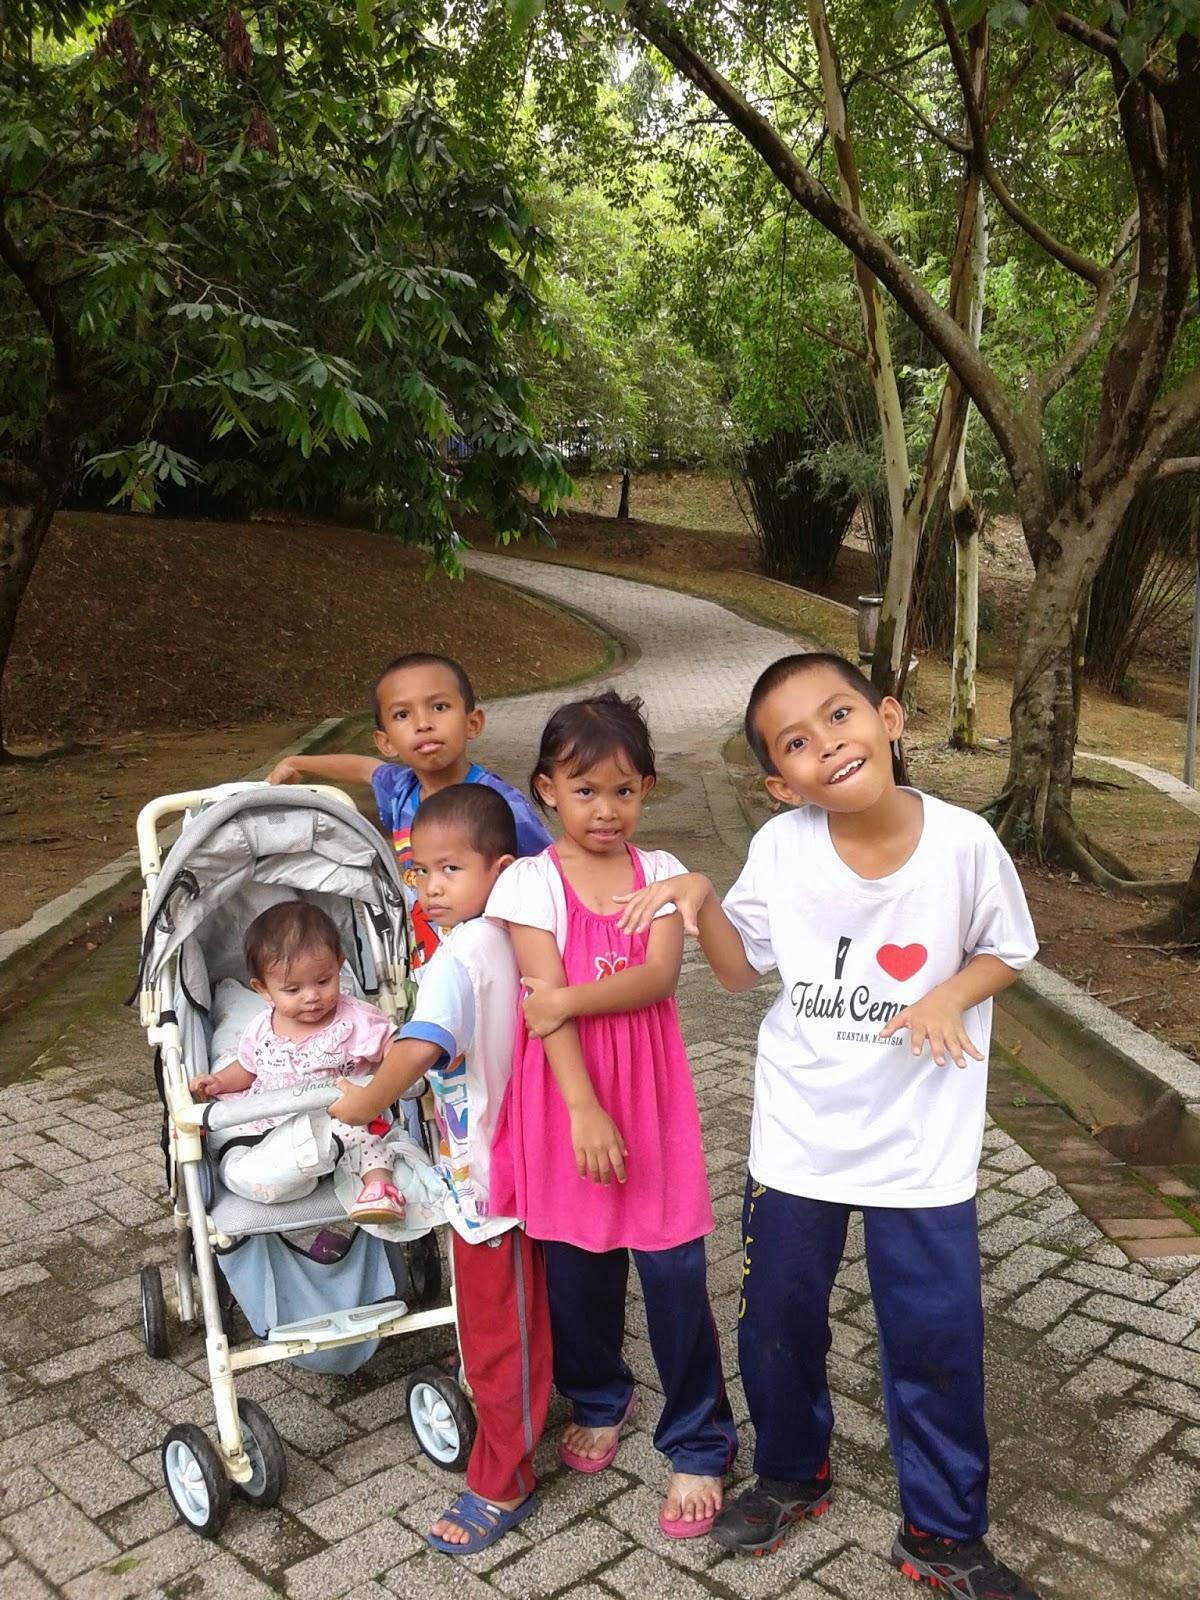 http://fiezabard.blogspot.com/2014/09/jogging-jogging-manja-di-taman-rekreasi.html